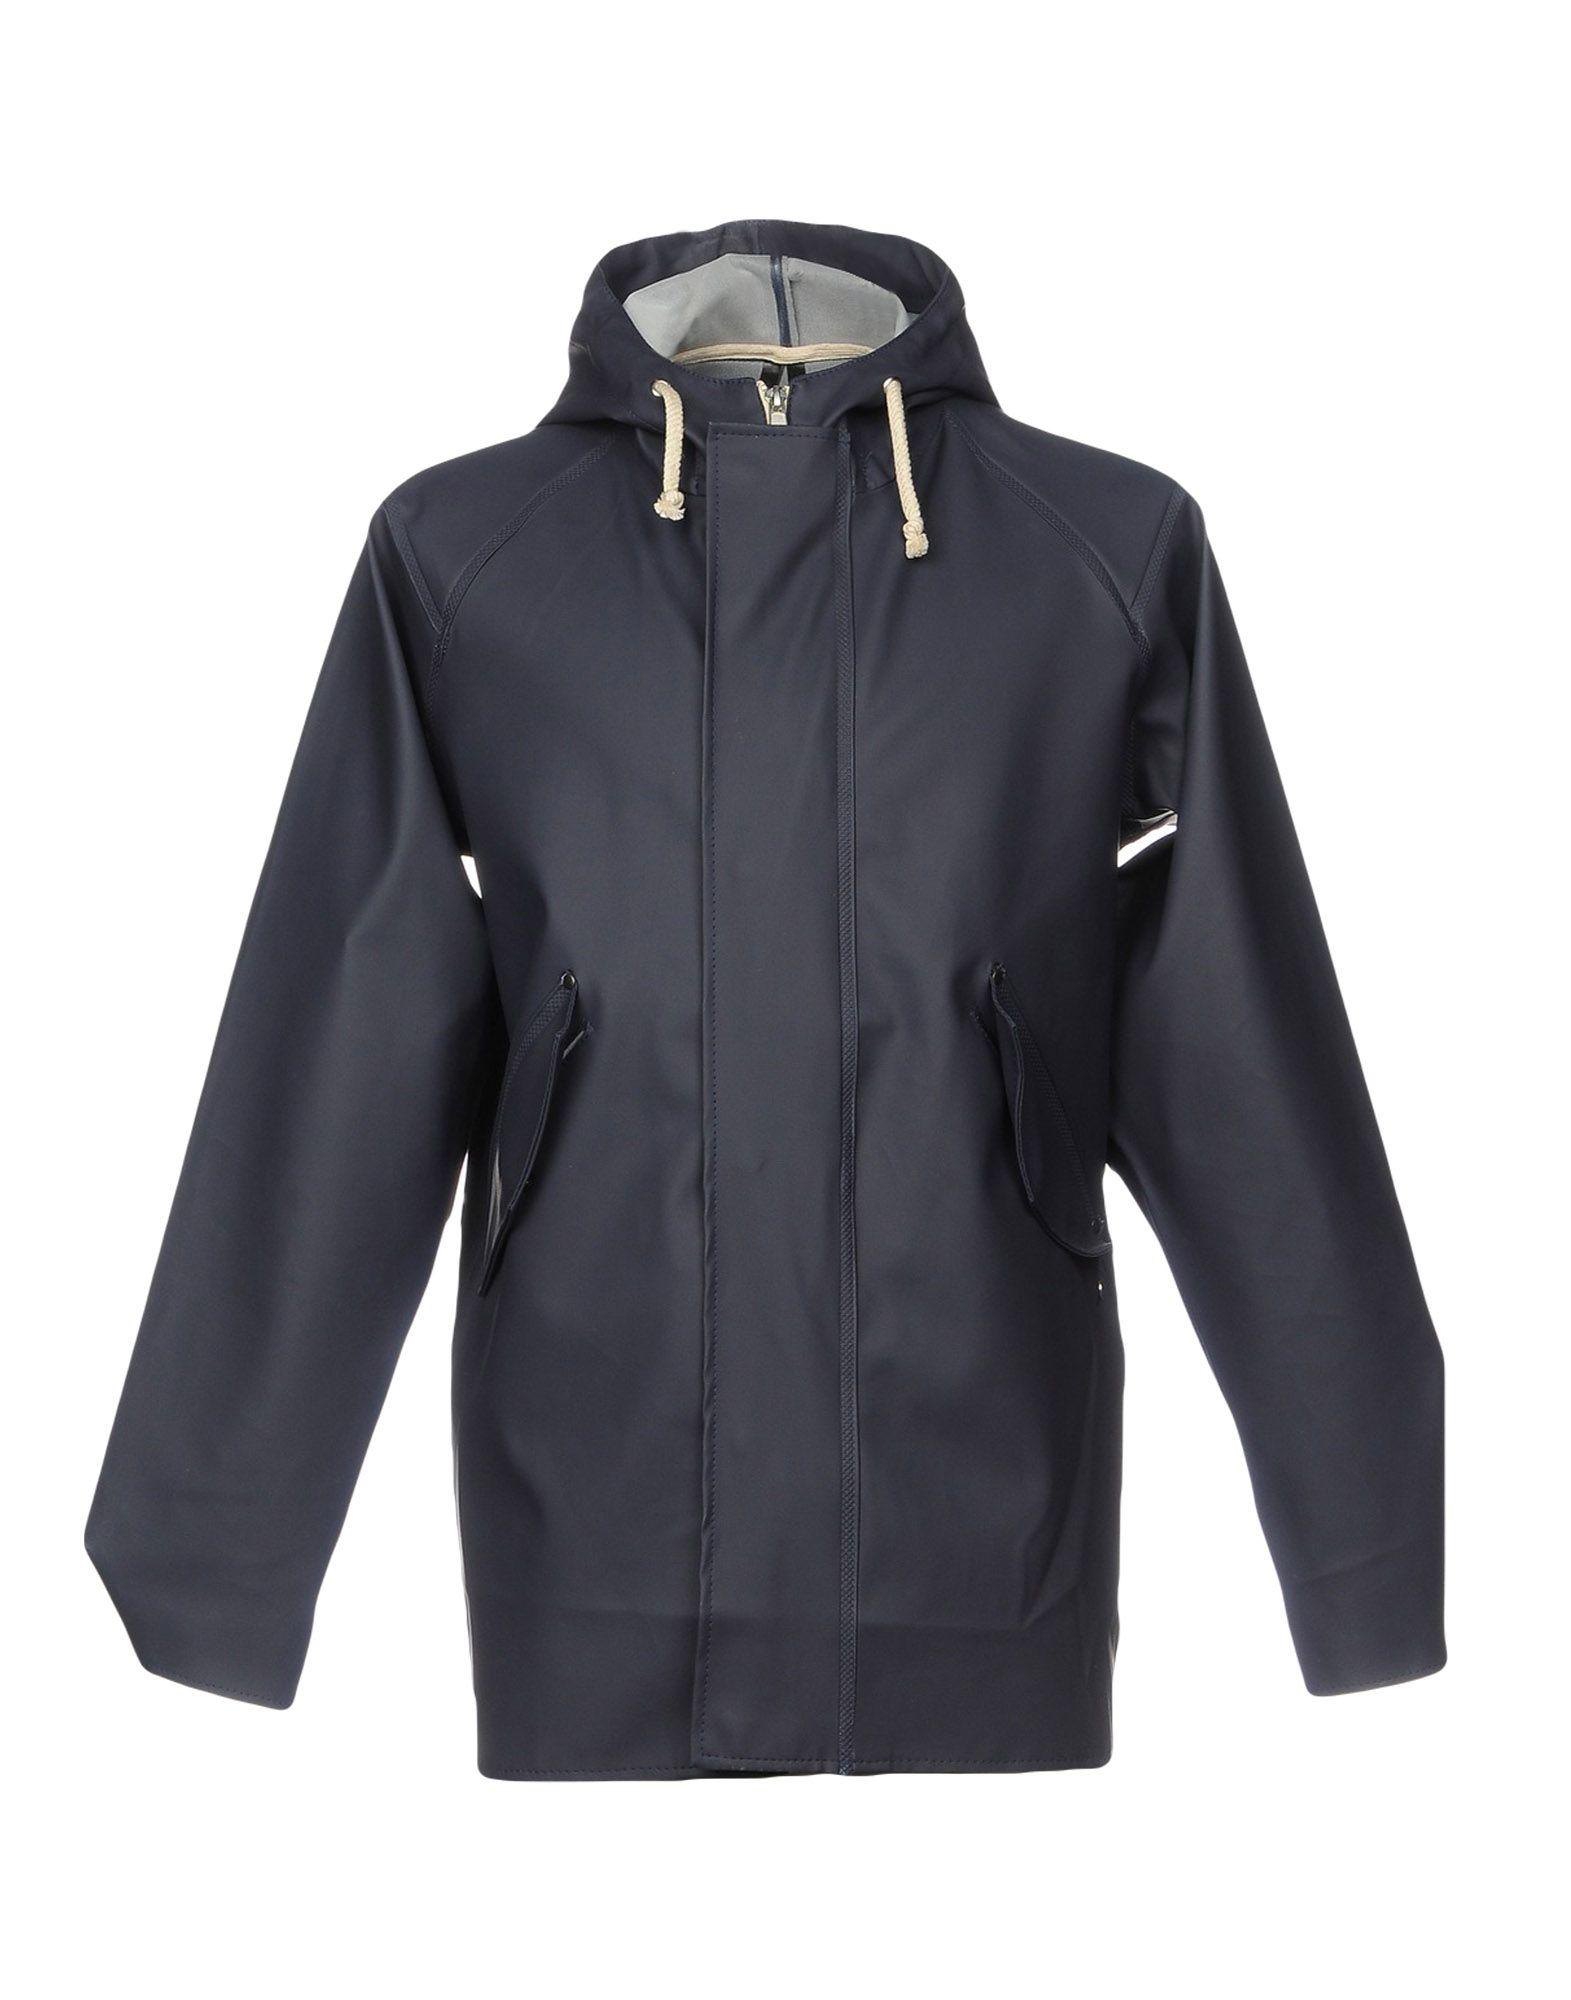 ELKA Full-Length Jacket in Dark Blue